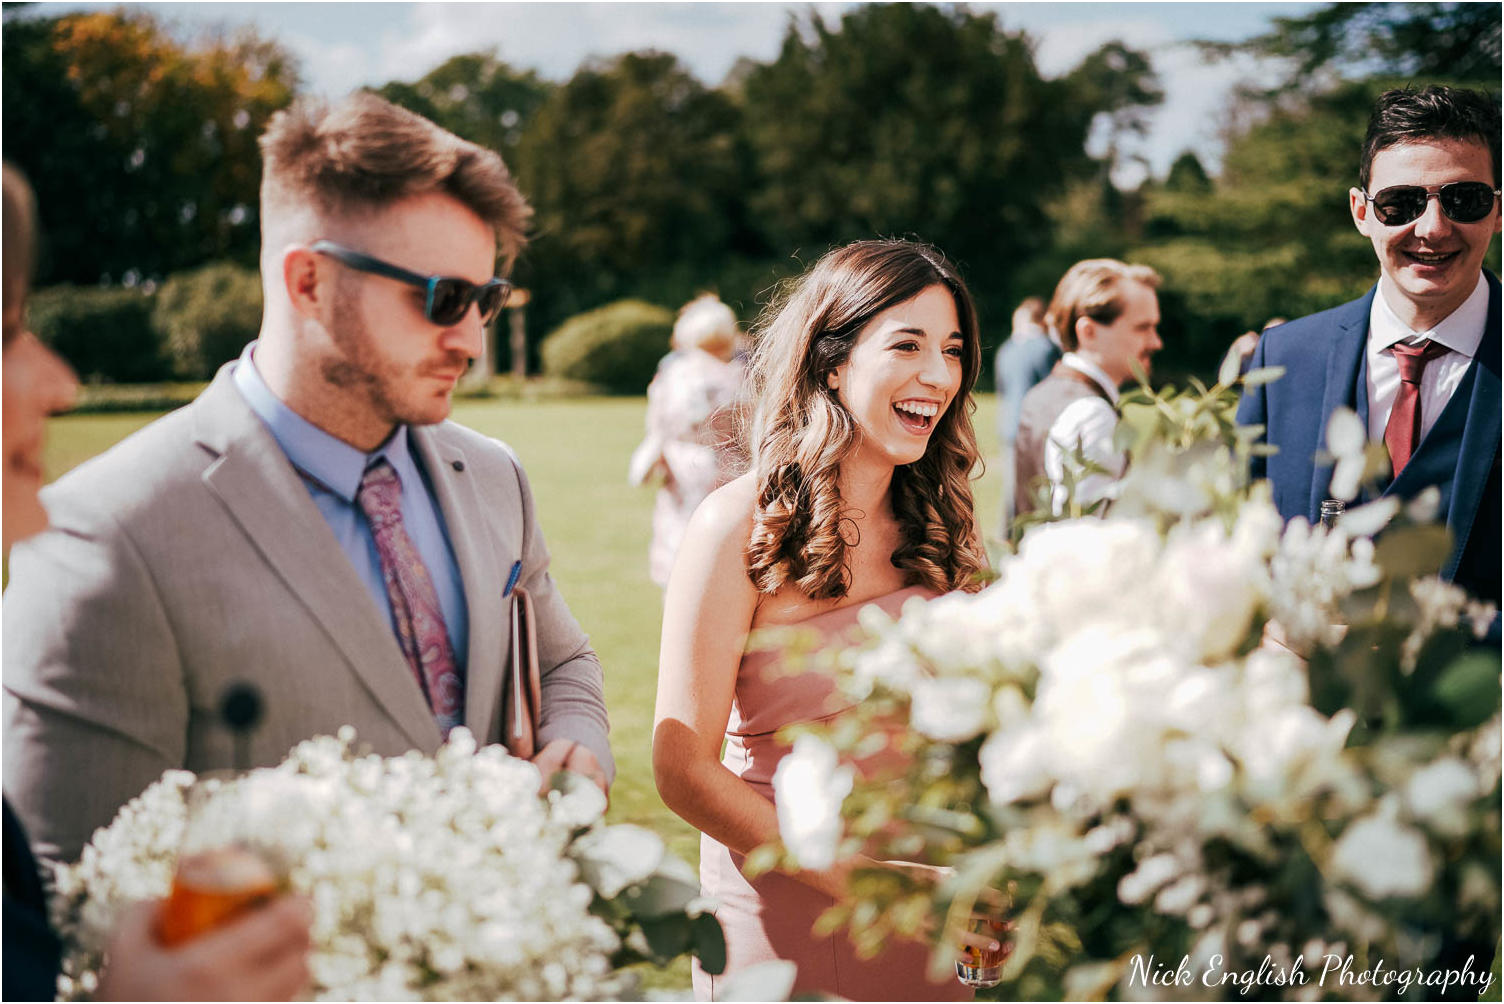 Eaves_Hall_Outdoor_Wedding_Photograph-47.jpg